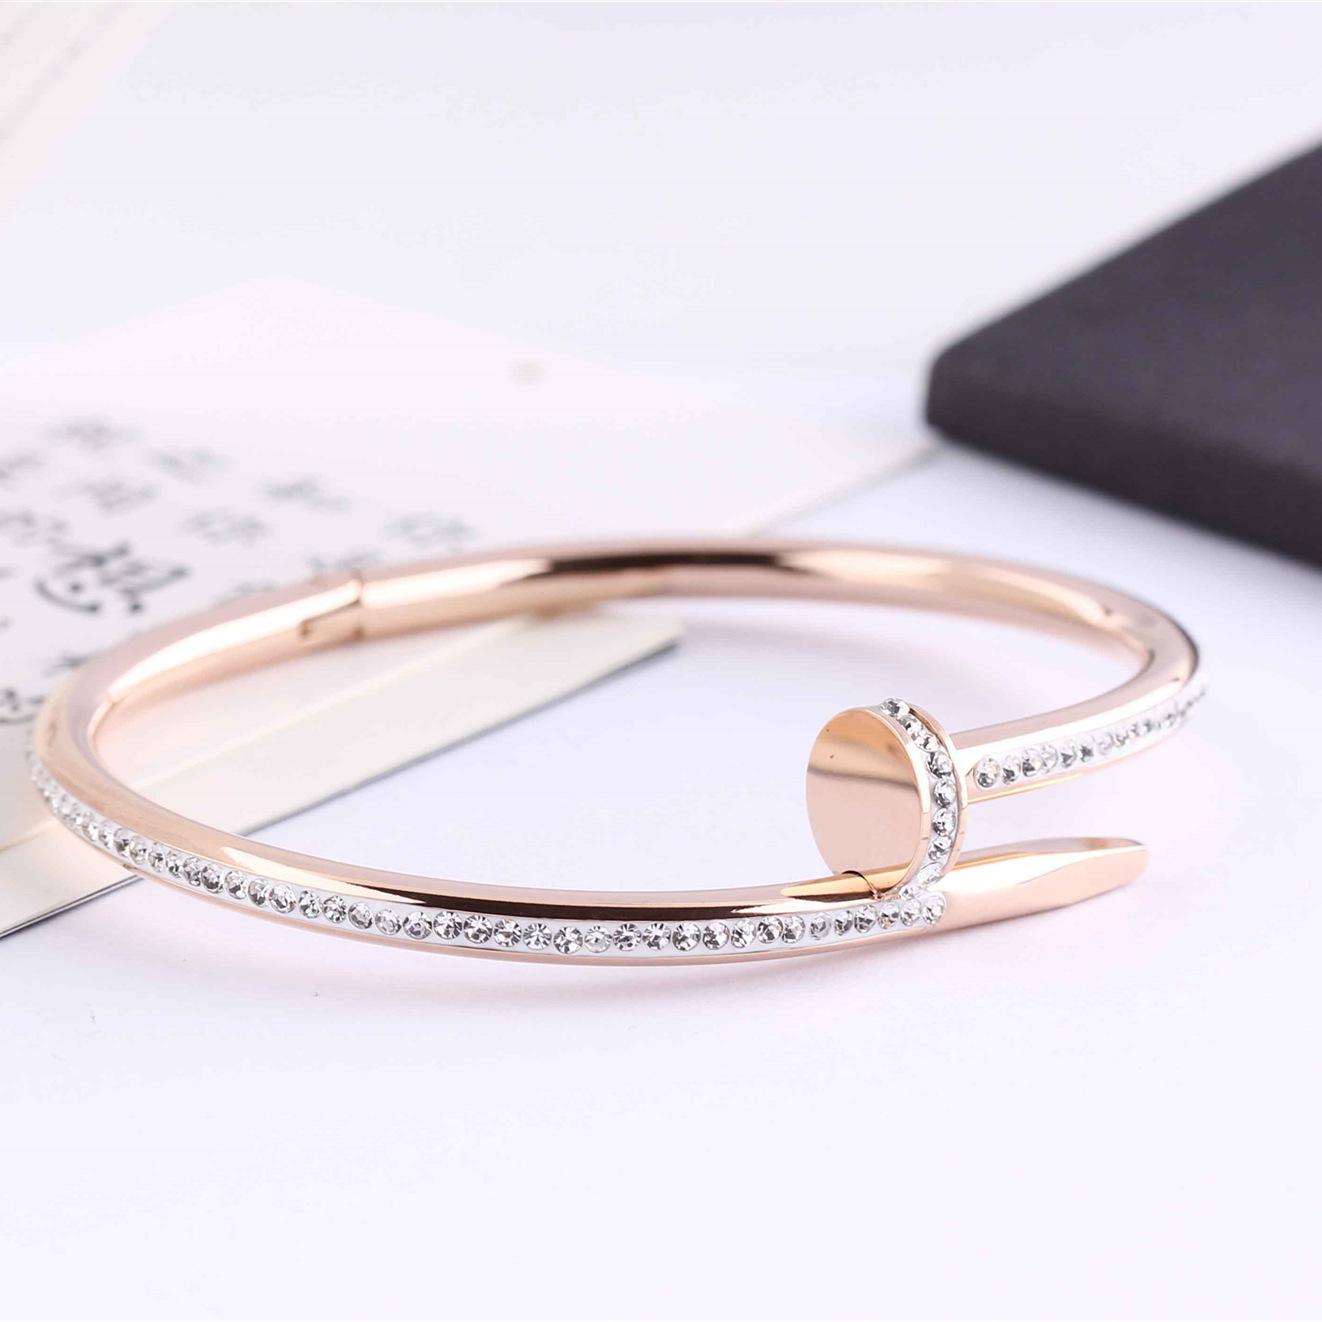 Titanium Steel Distance Bangle Bracelet Full Diamond Bracelets Women 5.8cm Fashion Gold Love Jewelry Gift For Lover No Box